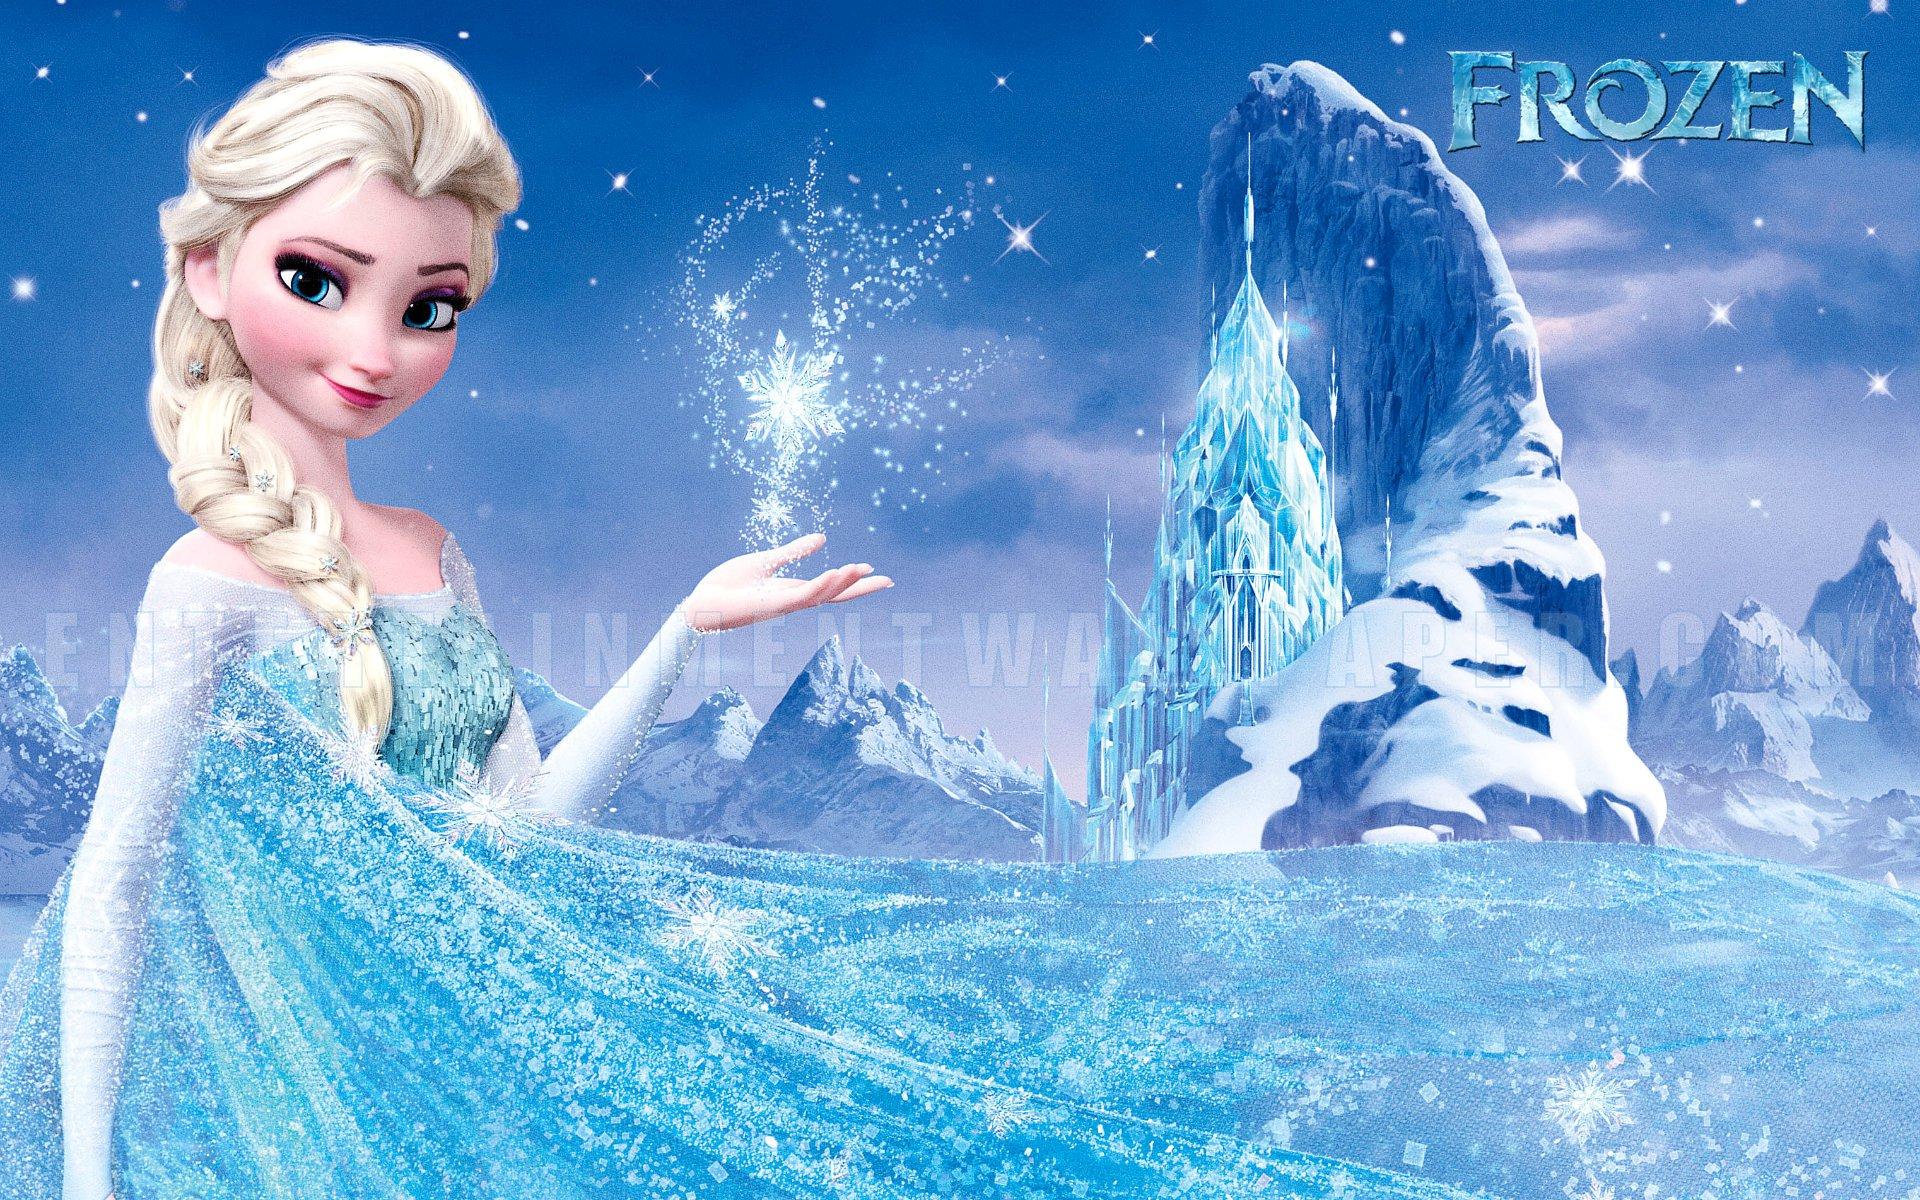 Frozen Elsa Wallpaper 1920x1200